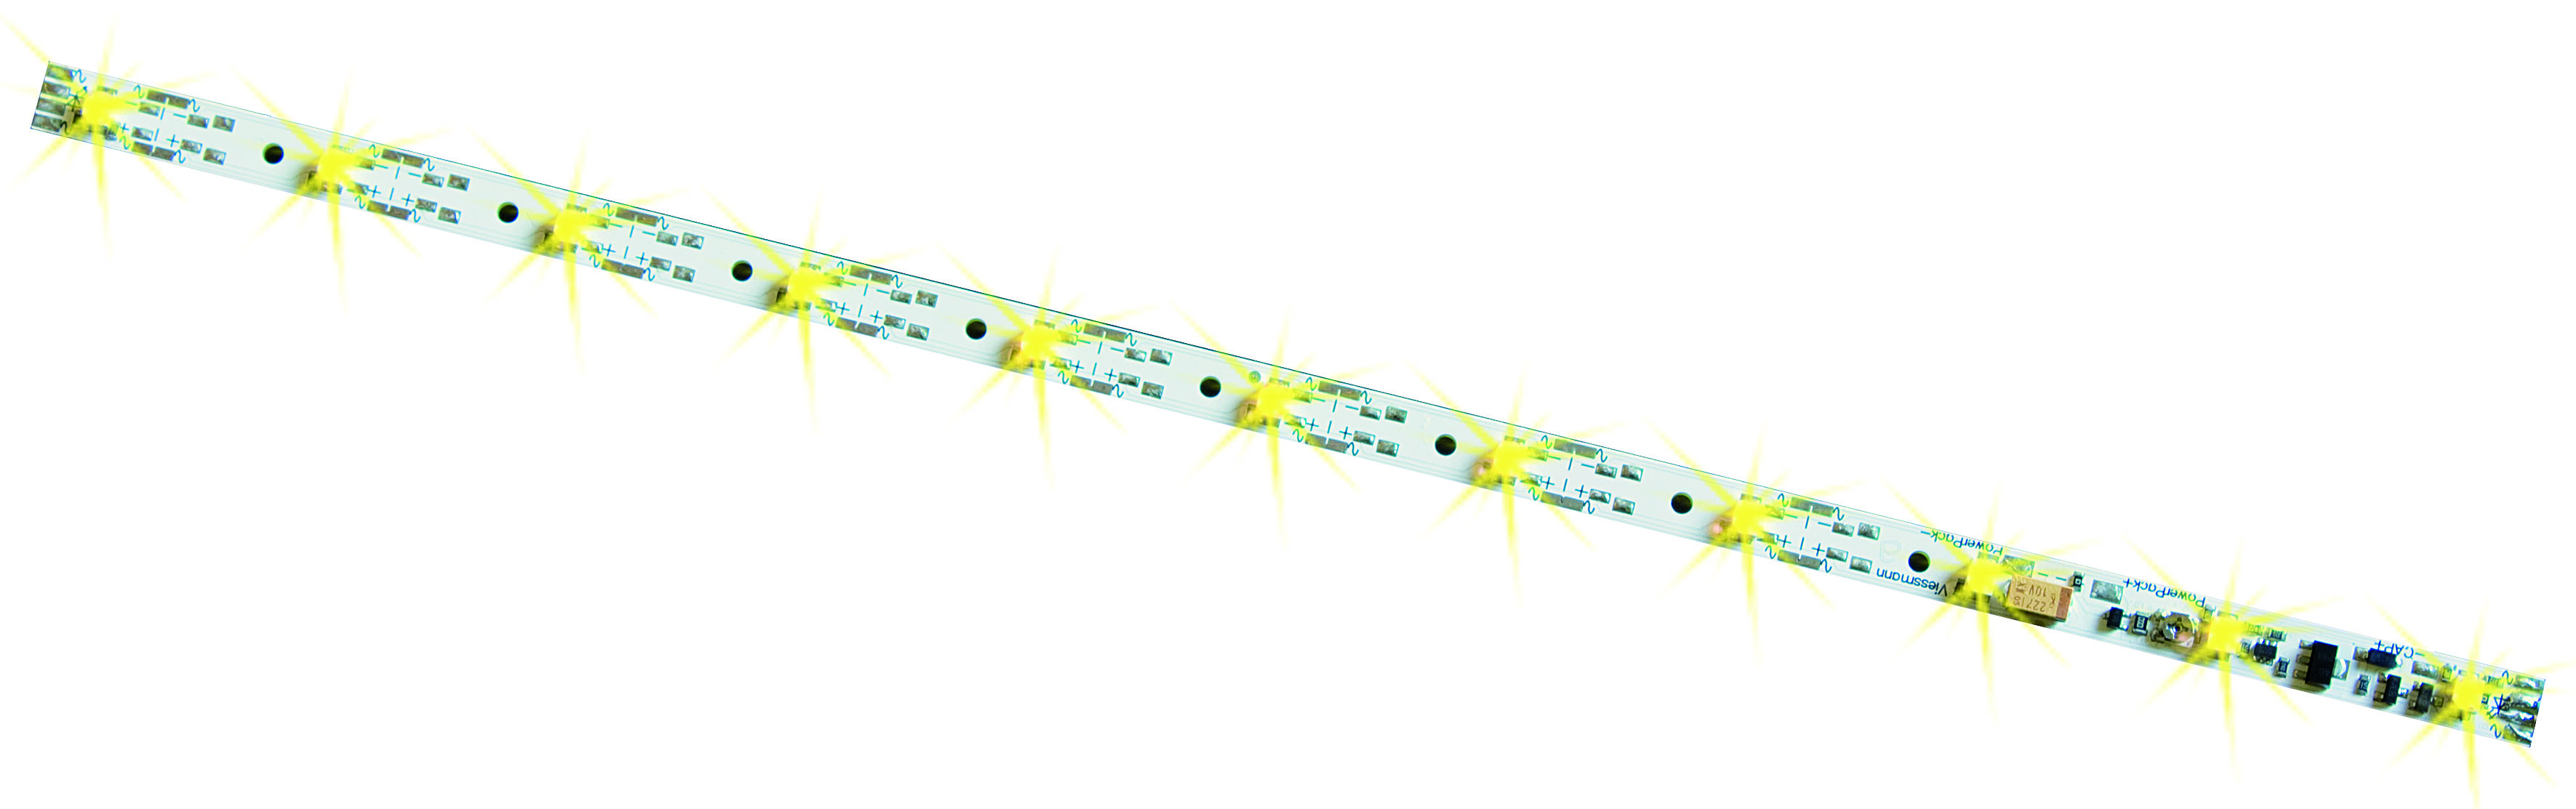 Viessmann 5076 H0 Waggon-Innenbeleuchtung, 11 LEDs gelb, mit Funktionsdecoder